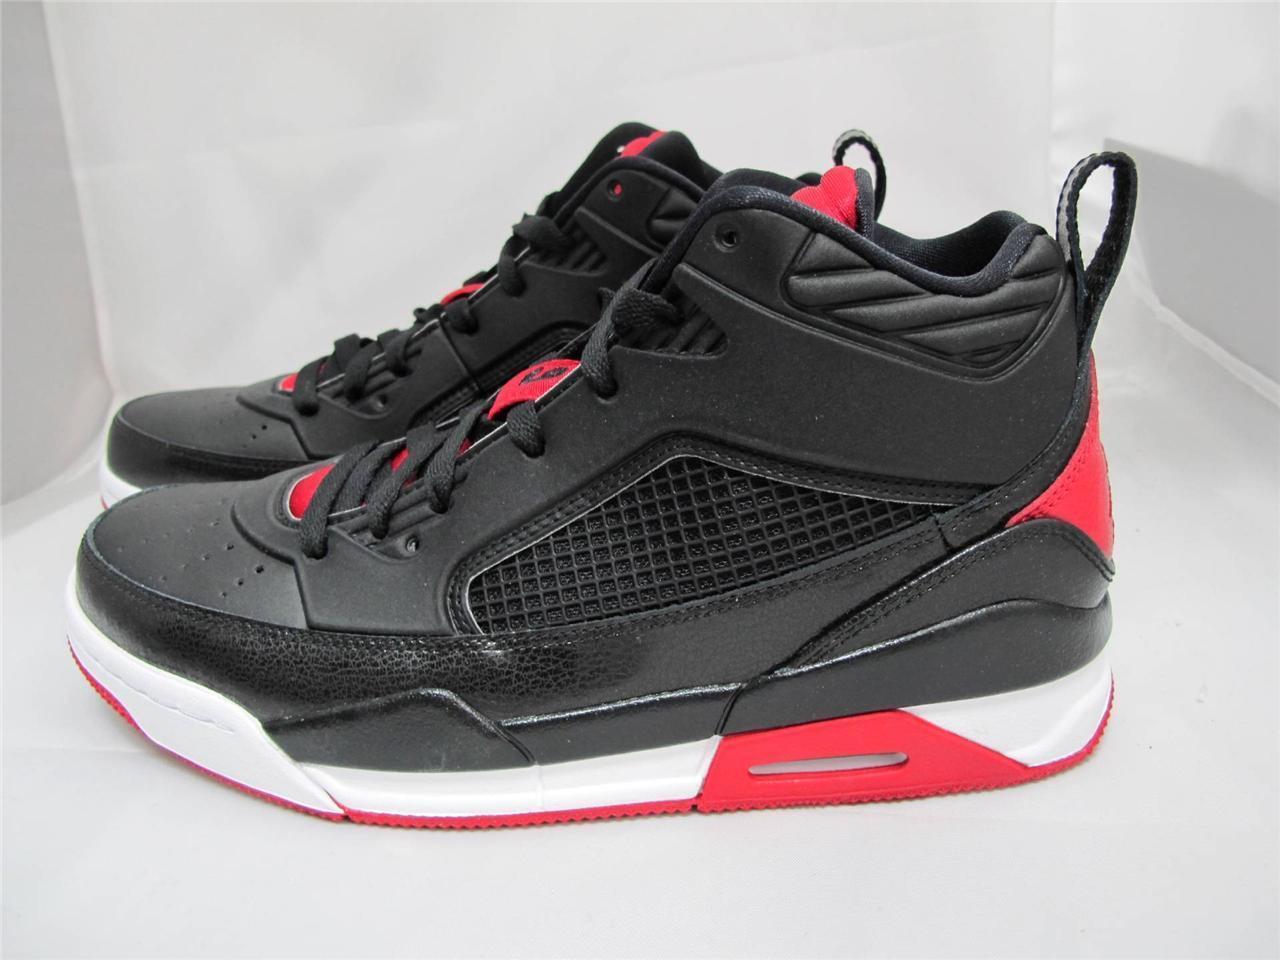 40e9728c1d20da NEW MEN S JORDAN FLIGHT 9.5 654262-001 nihubg9979-Athletic Shoes ...